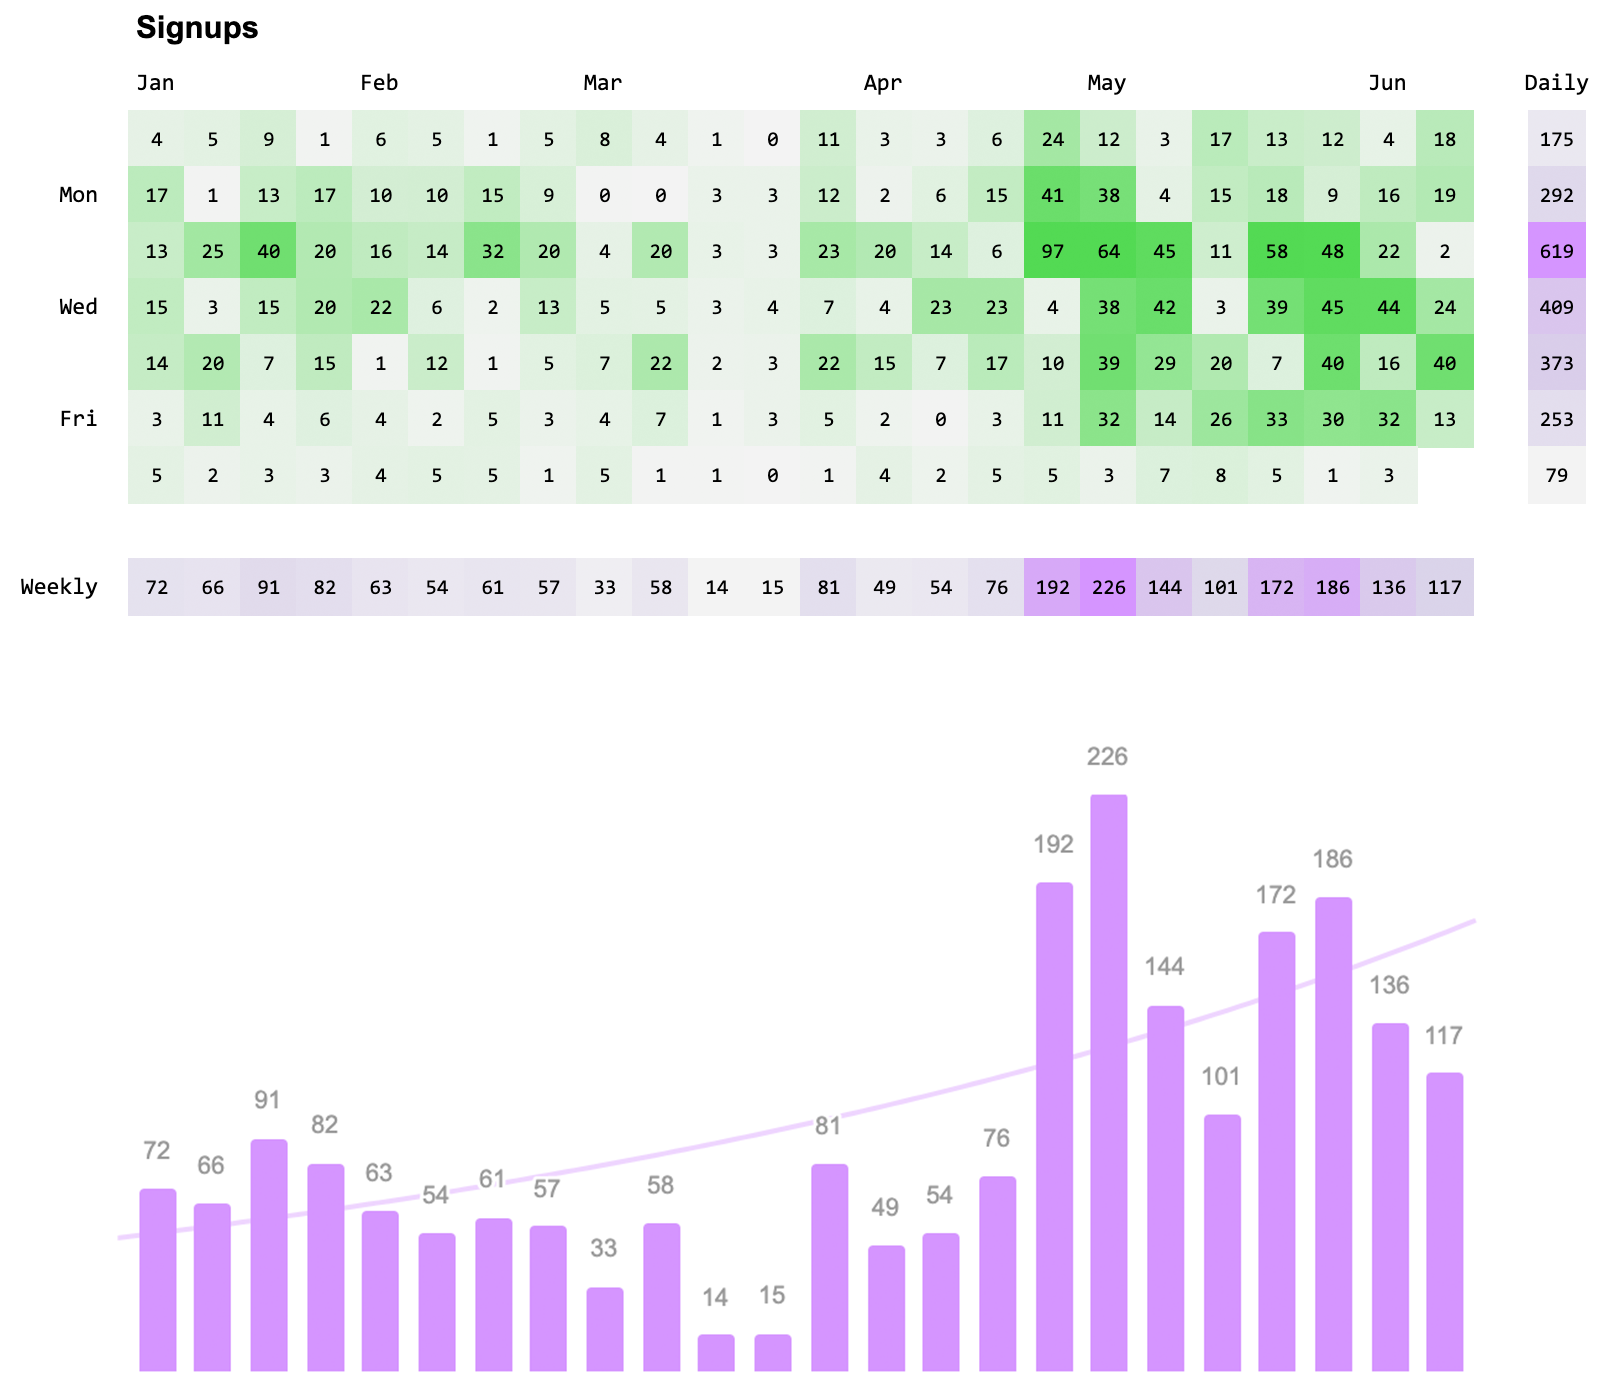 Calendar graph of signups